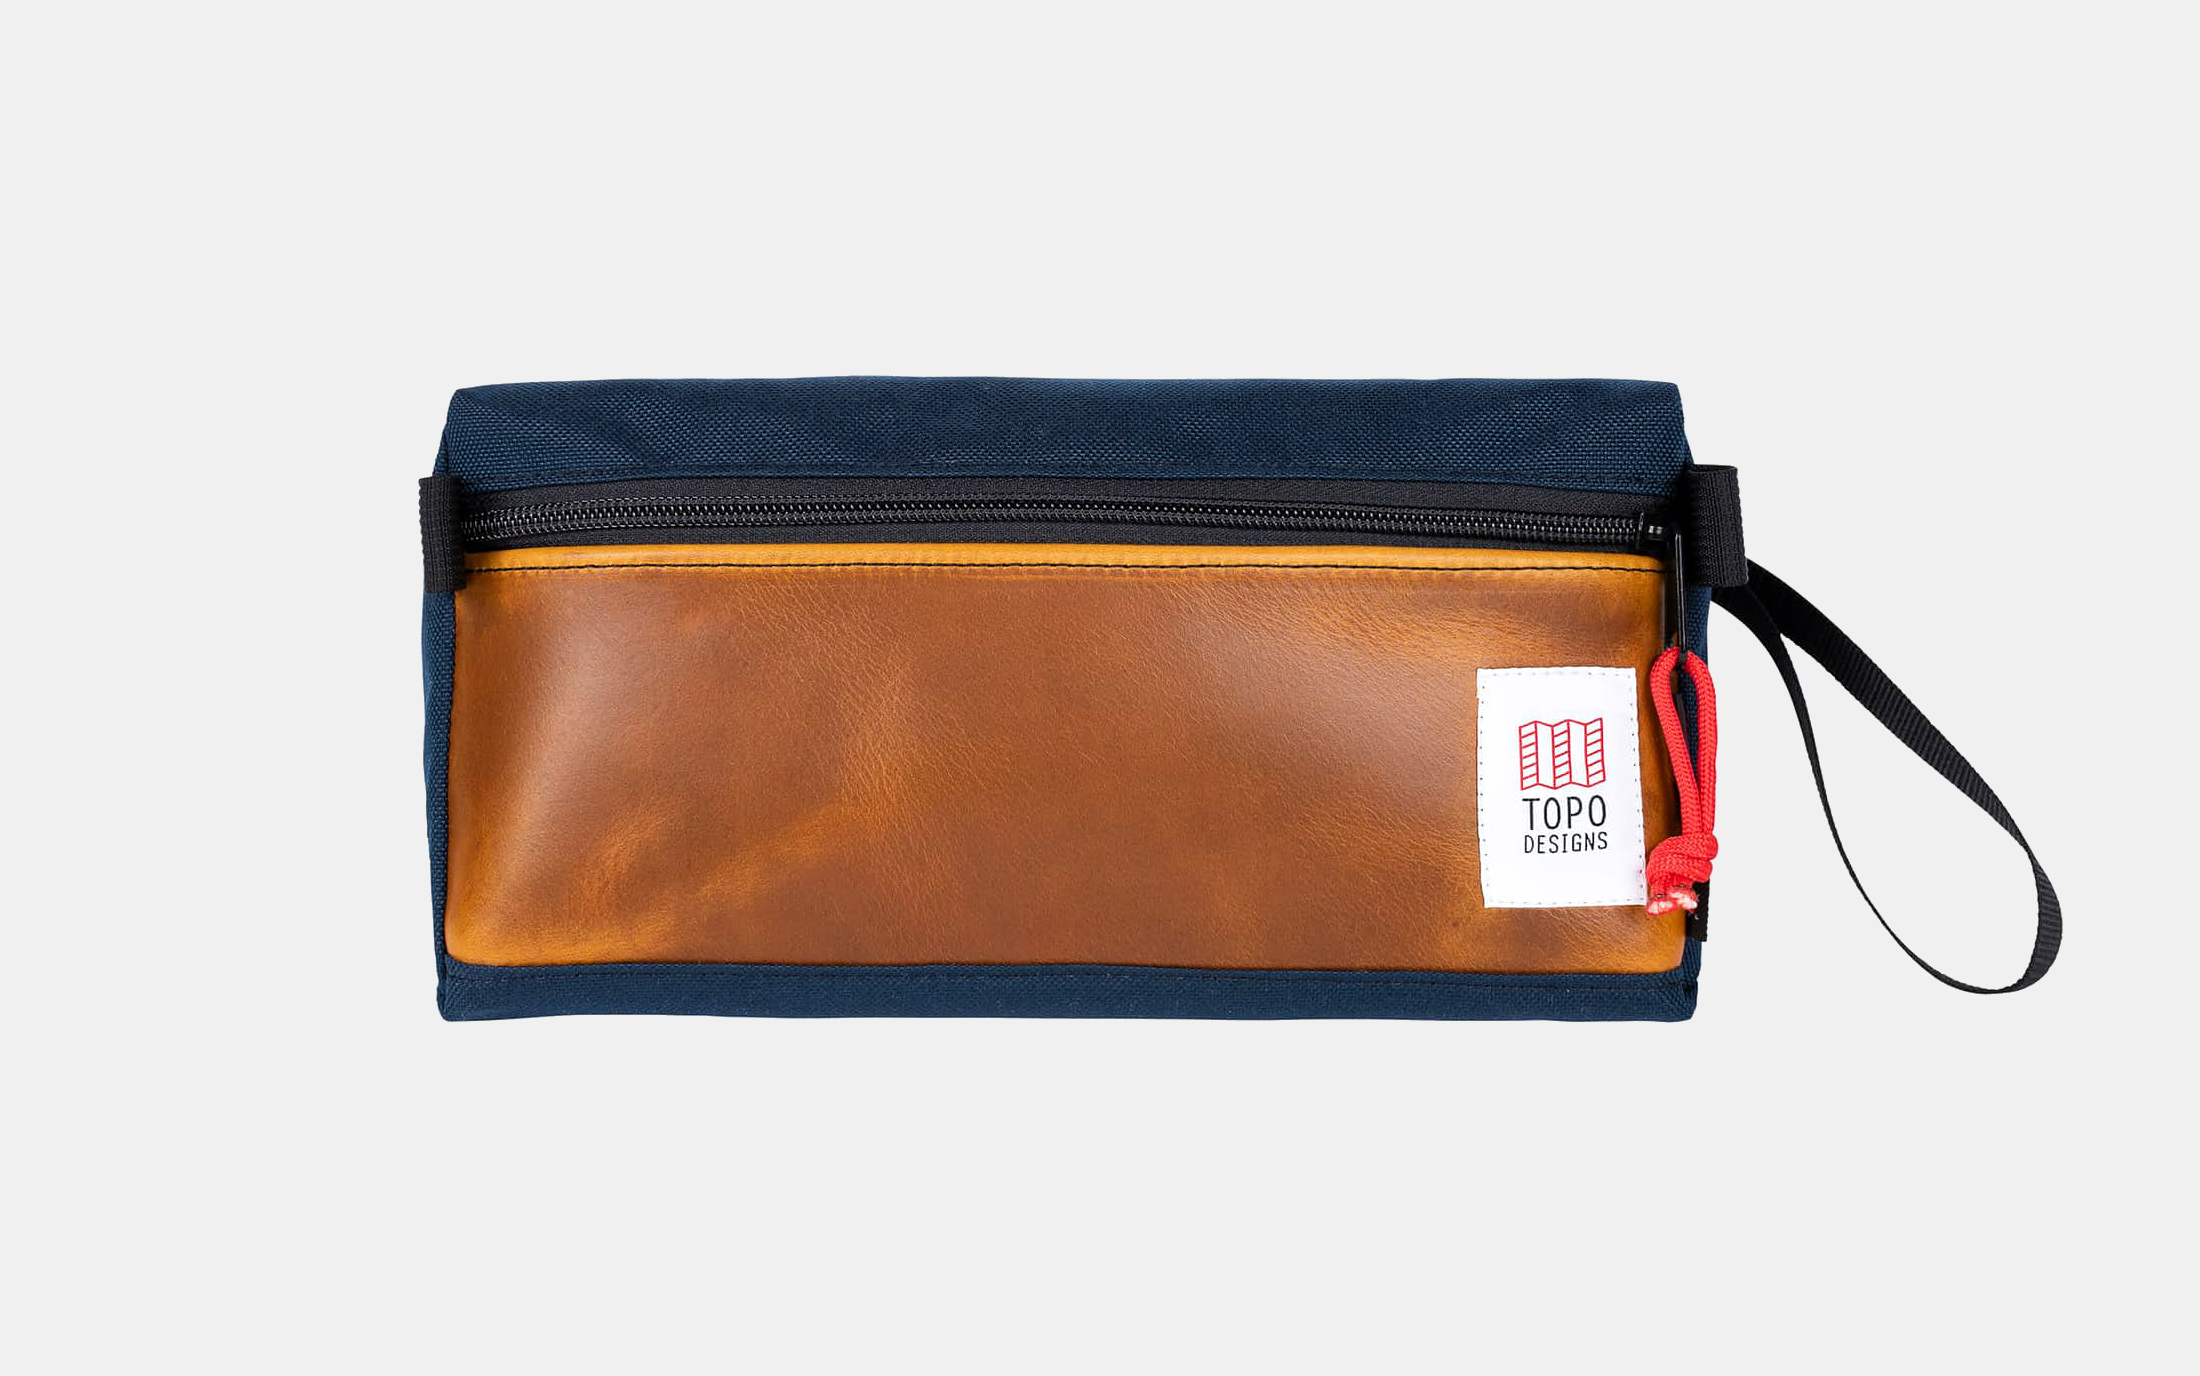 Topo Designs Leather Dopp Kit